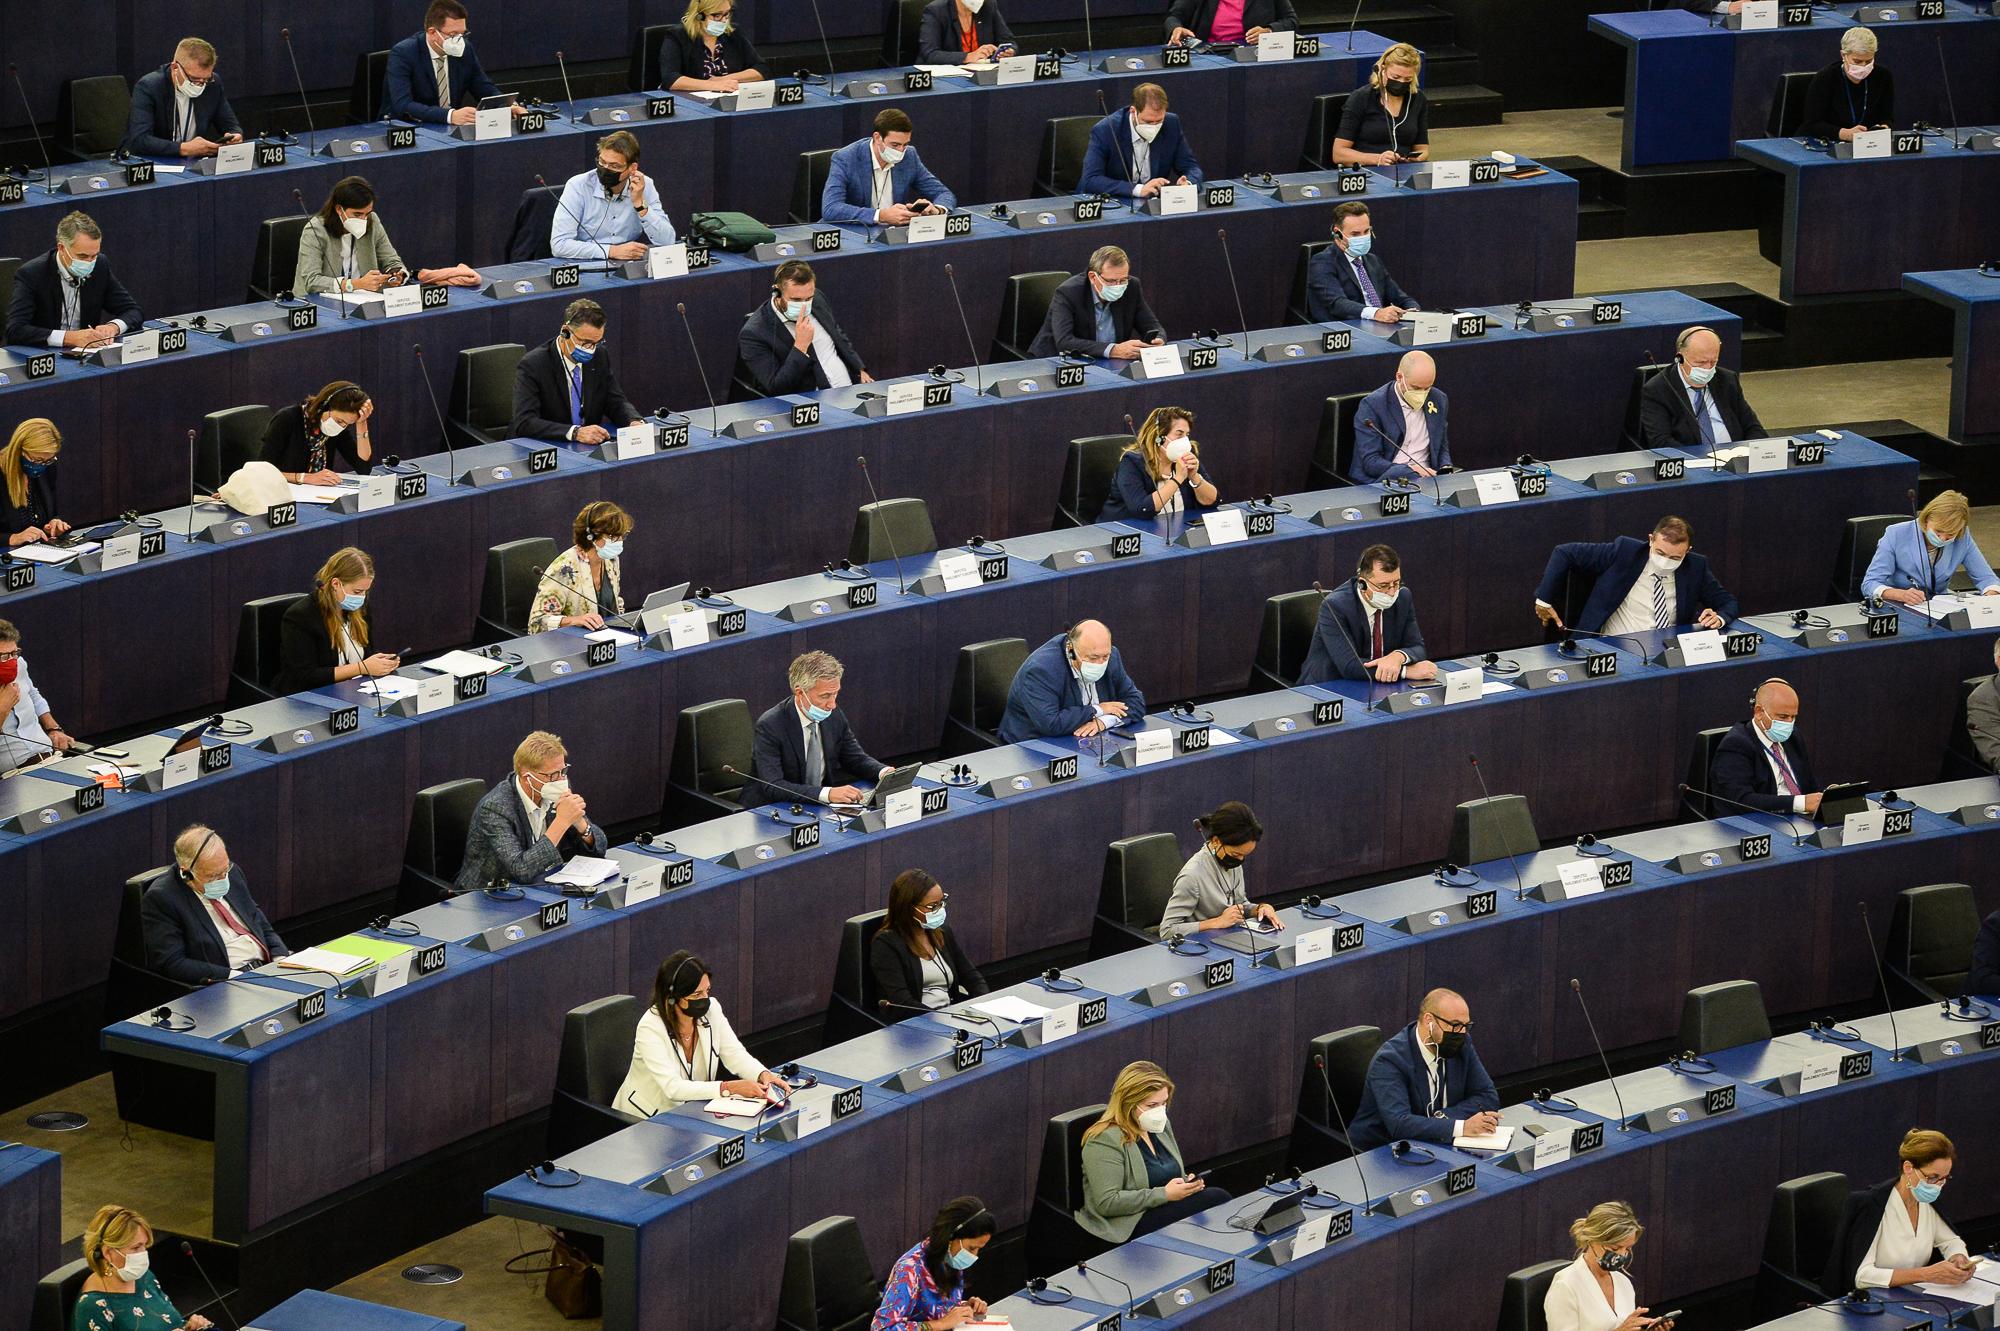 FACEBOOK: MEPs invite Frances Haugen